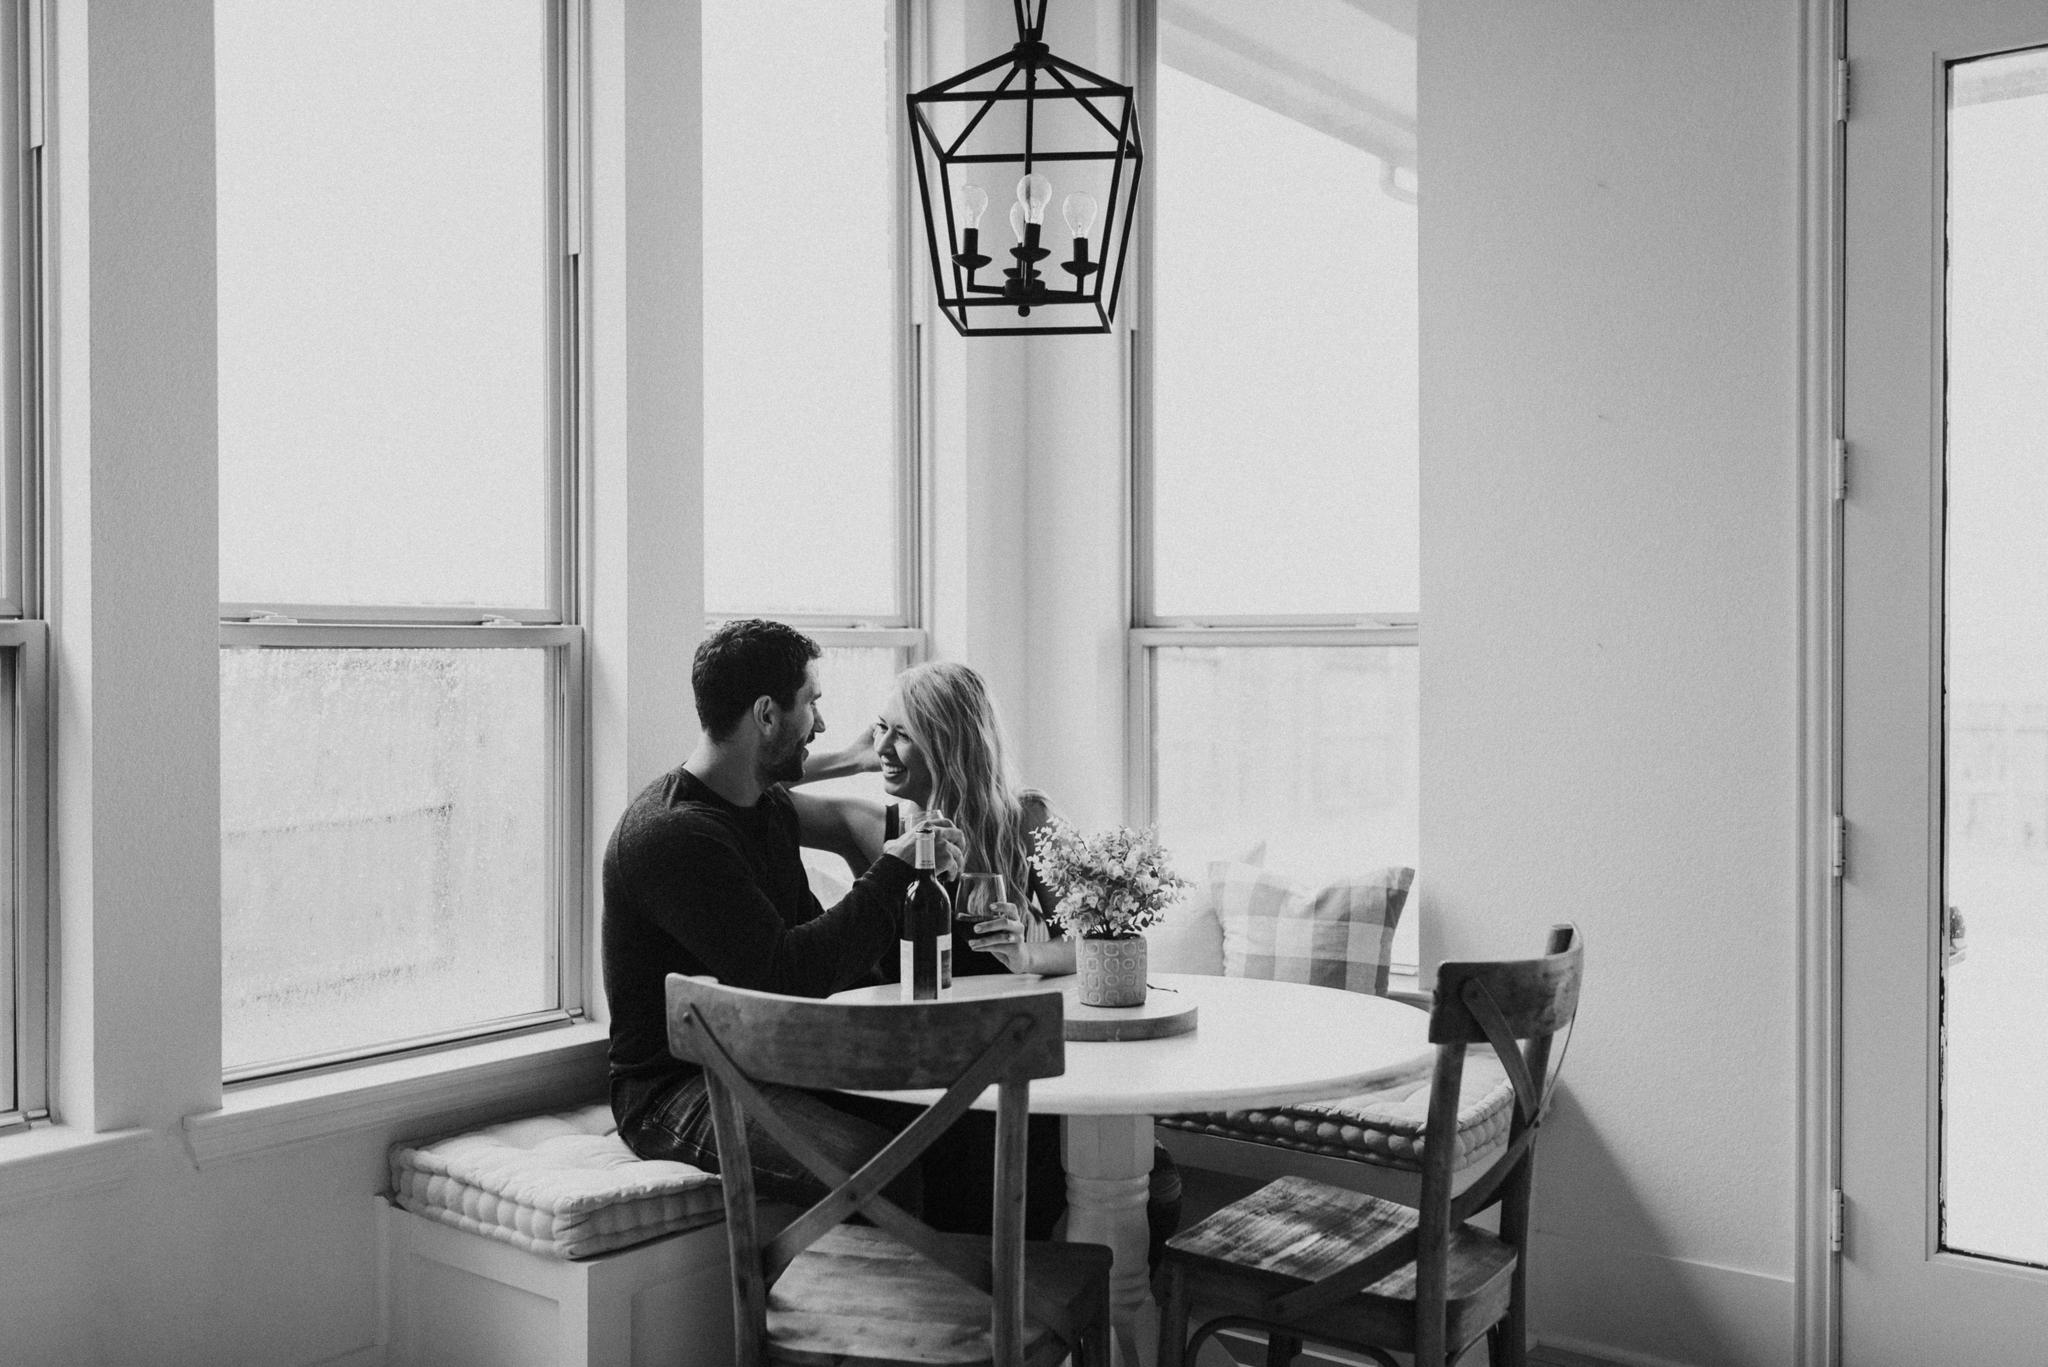 Houston Wedding Photographer-Houston In Home Engagement Session- Houston Wedding Photographer -Kristen Giles Photography-105.jpg